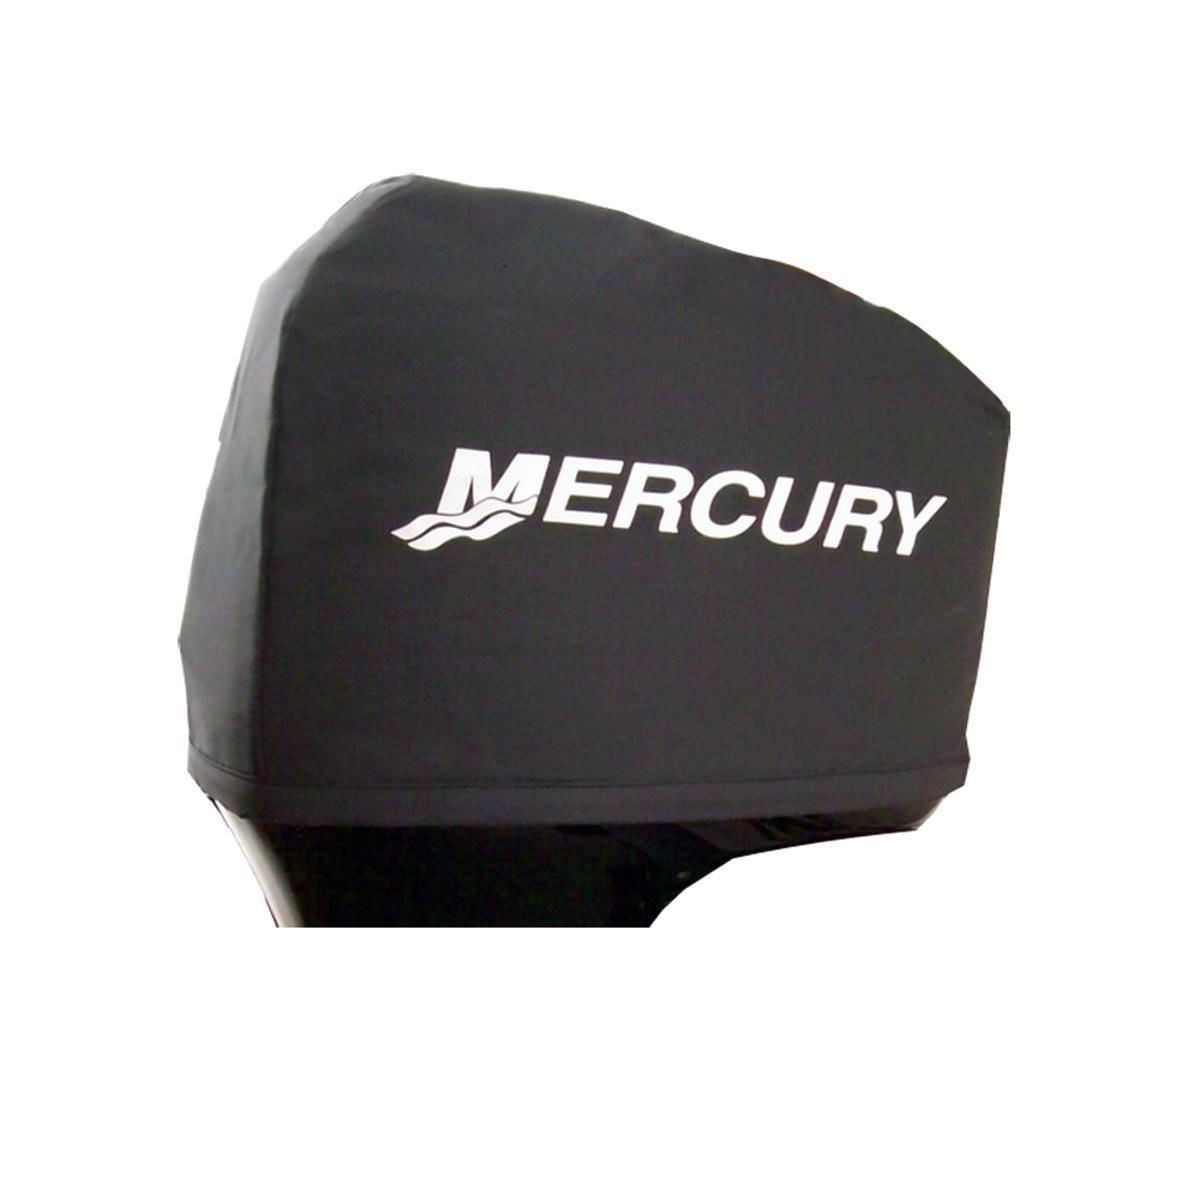 Cheap Mercury 75 Optimax Problems, find Mercury 75 Optimax Problems